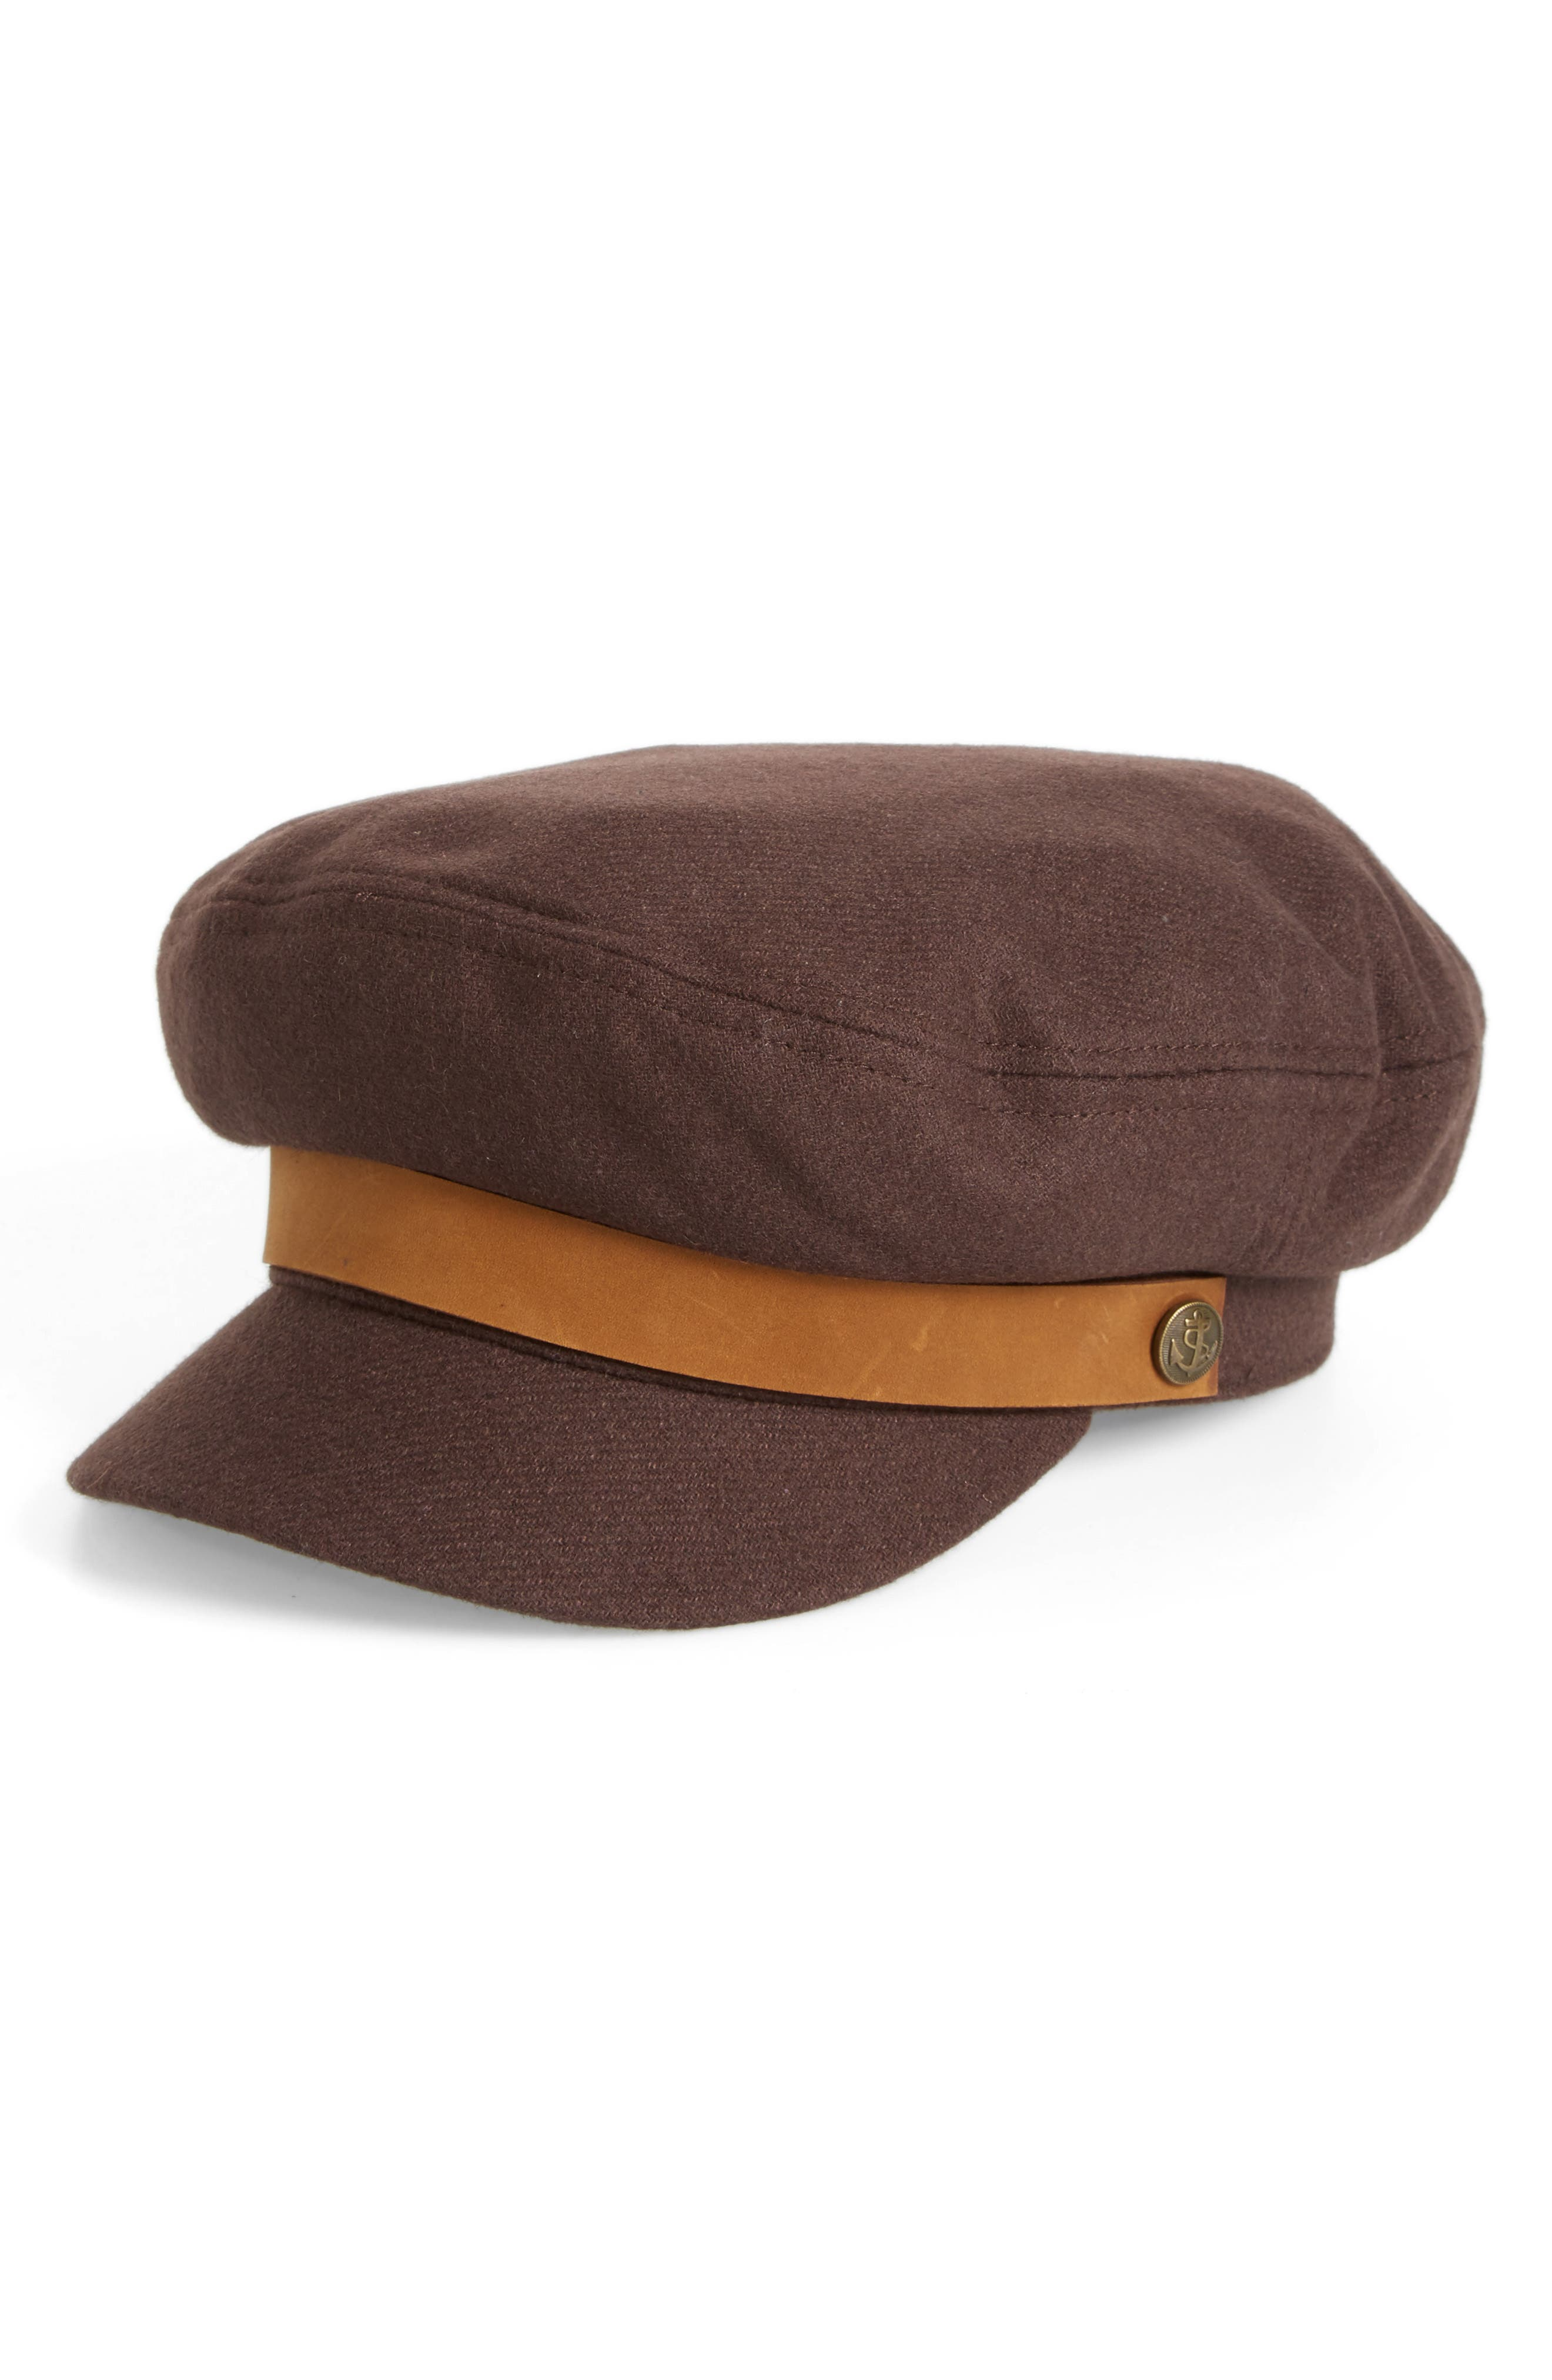 e77f9355 spain brixton hats brood tonal herringbone cotton newsboy cap 8a5a6 b968c;  where can i buy brixton fiddler newsboy cap main faaab a175c